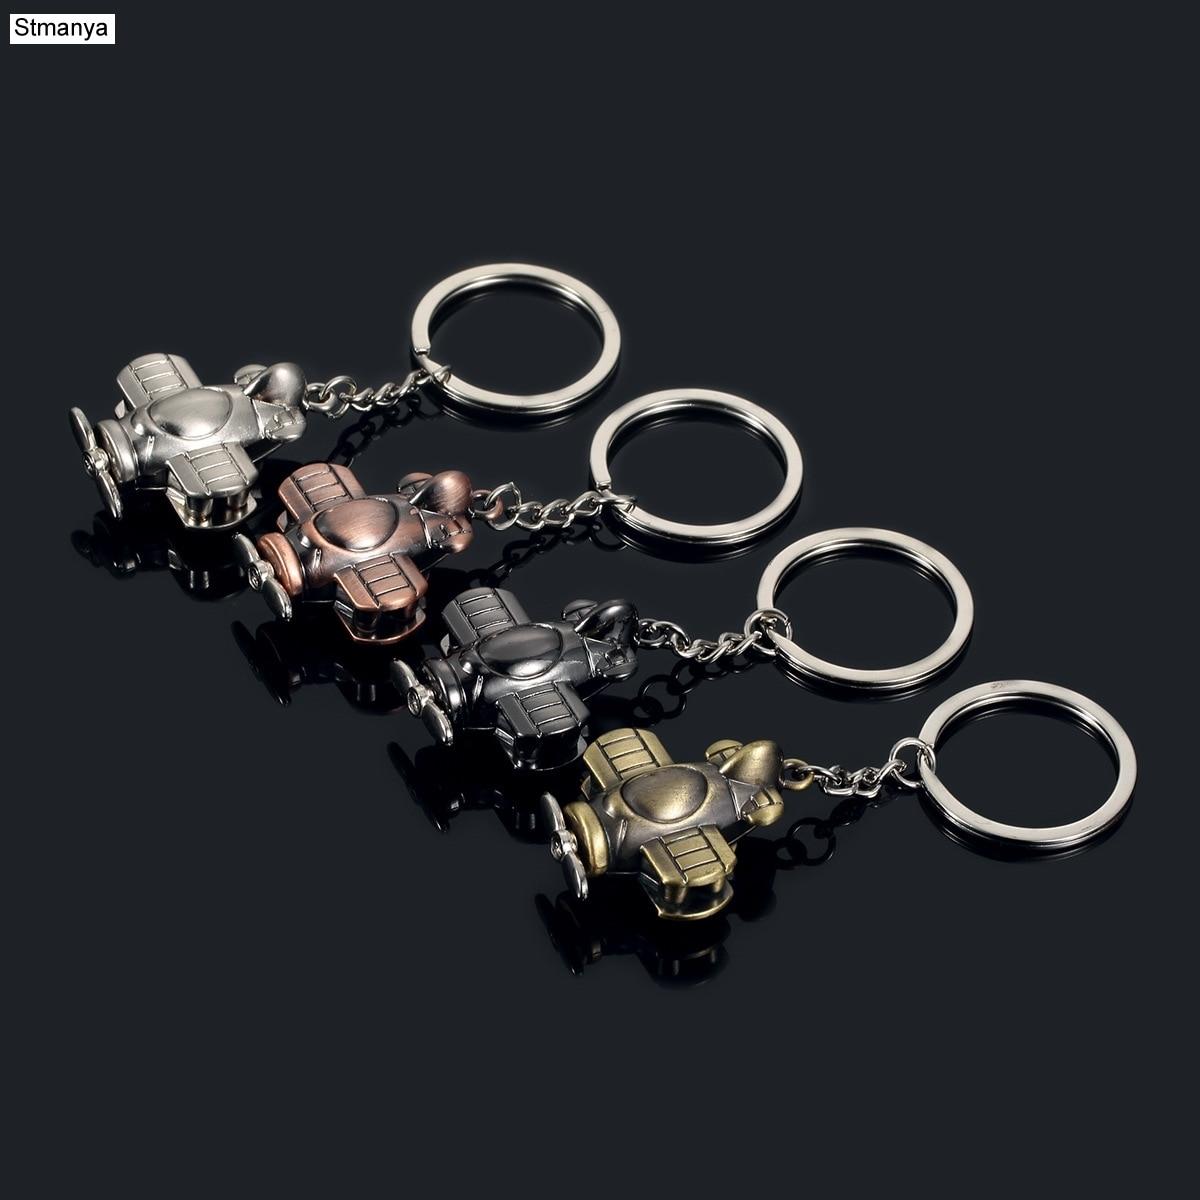 Fashion New Men Key Chain Car Women Car Metal Keychain Creative Party Gift Jewelry Aircraft Bag Charm Accessories Key Ring K1311